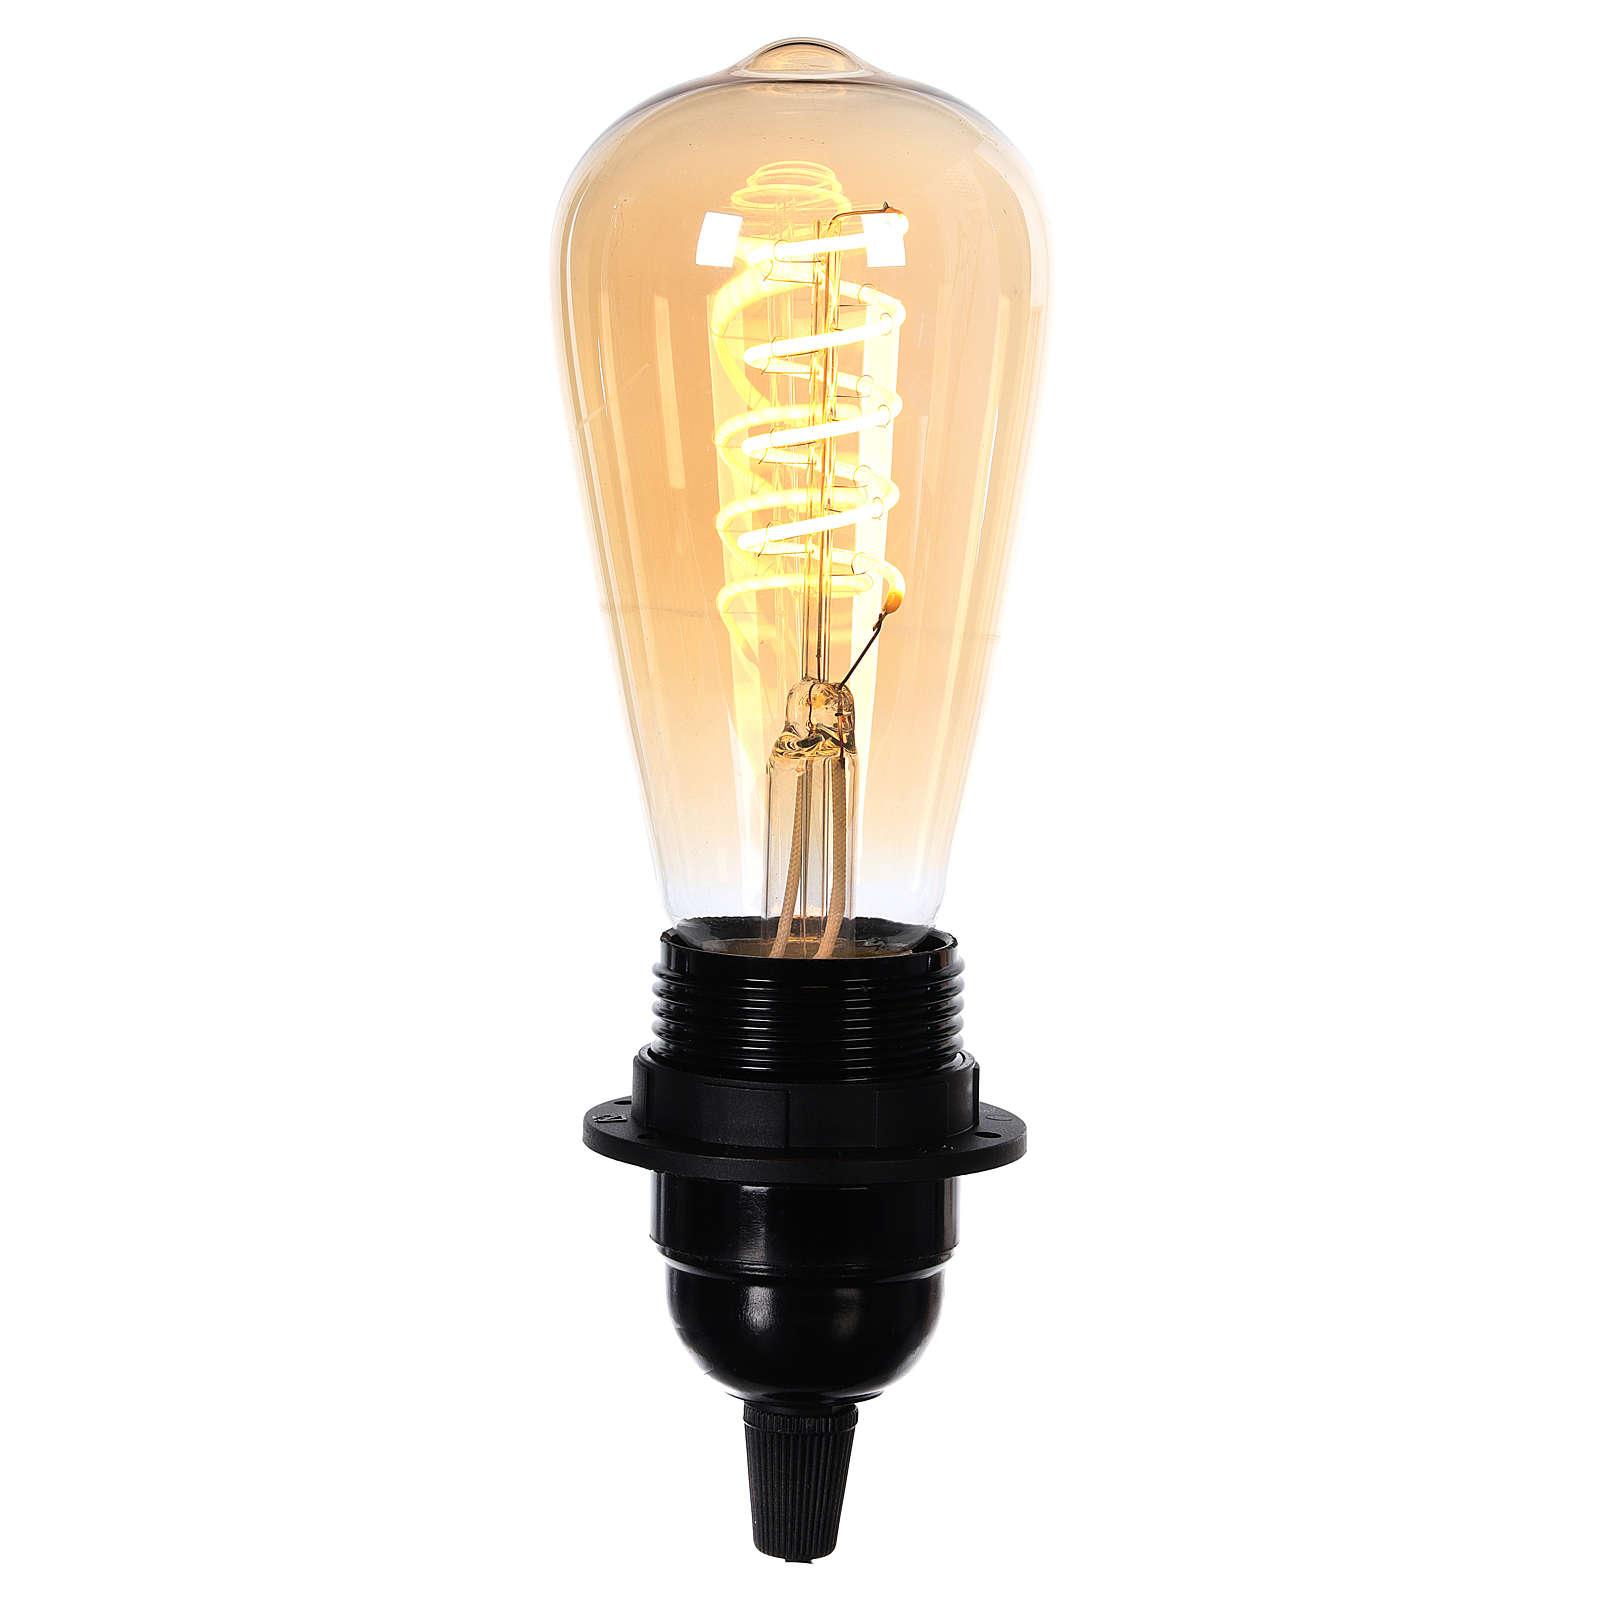 Nativity scene amber light bulb E27 4W 4